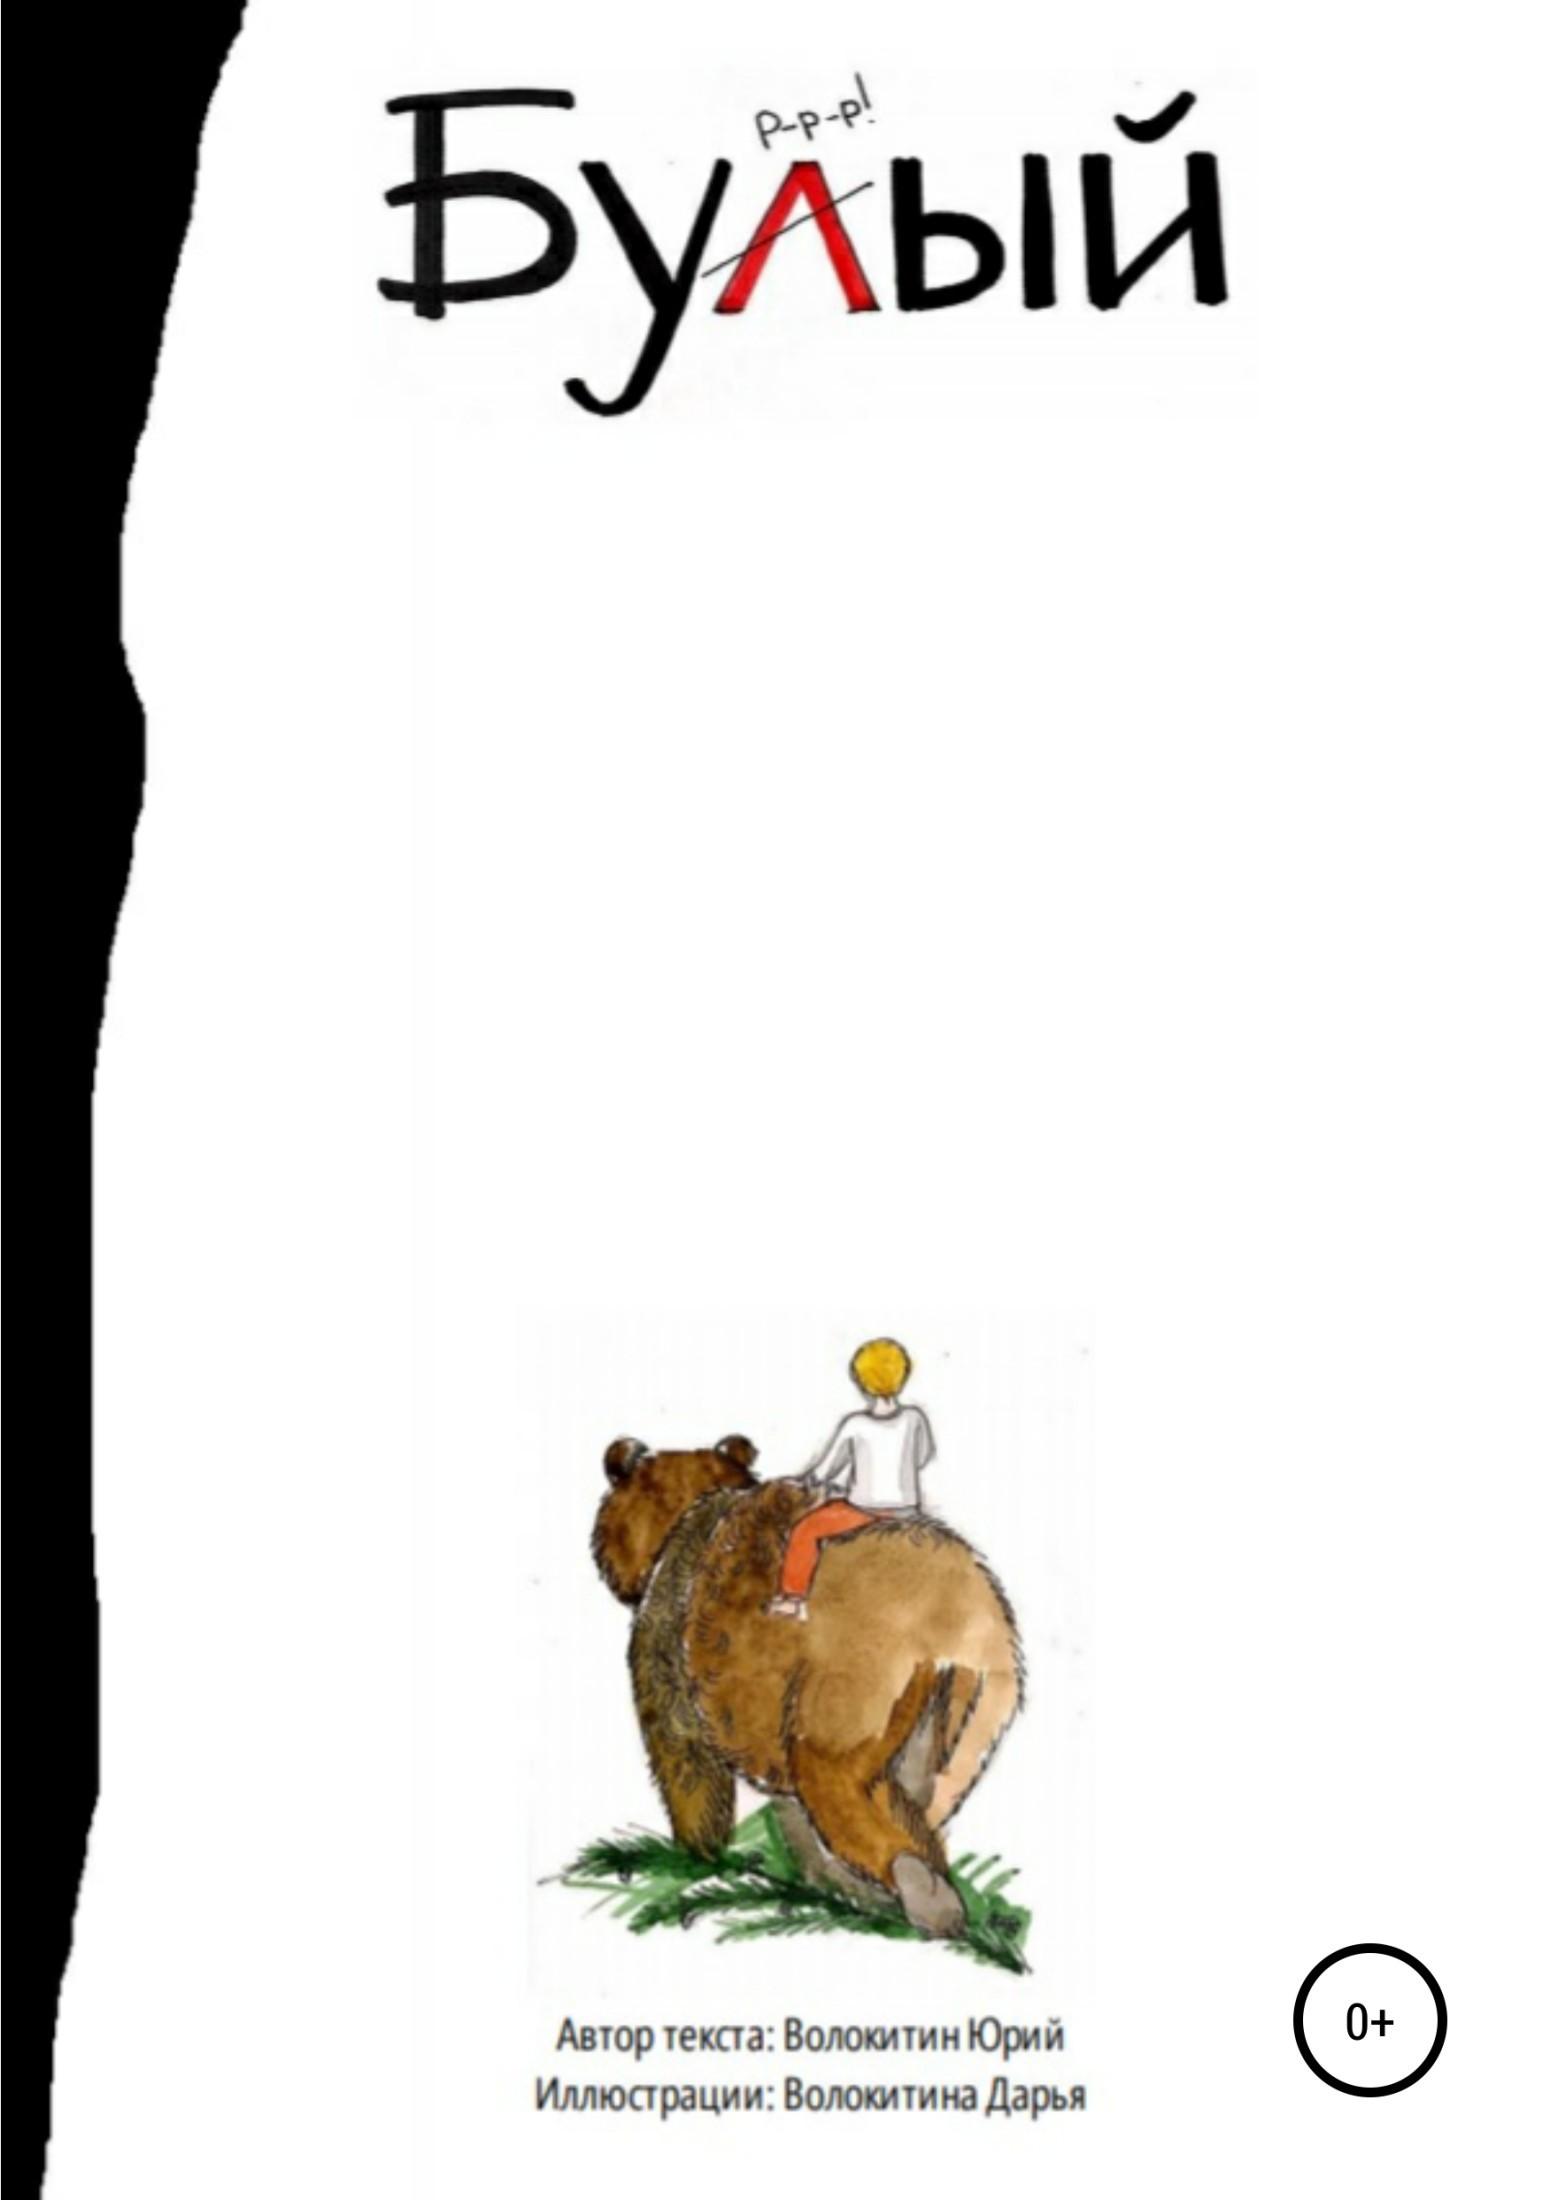 цена Юрий Сергеевич Волокитин Бурый и Малыш. Знакомство онлайн в 2017 году